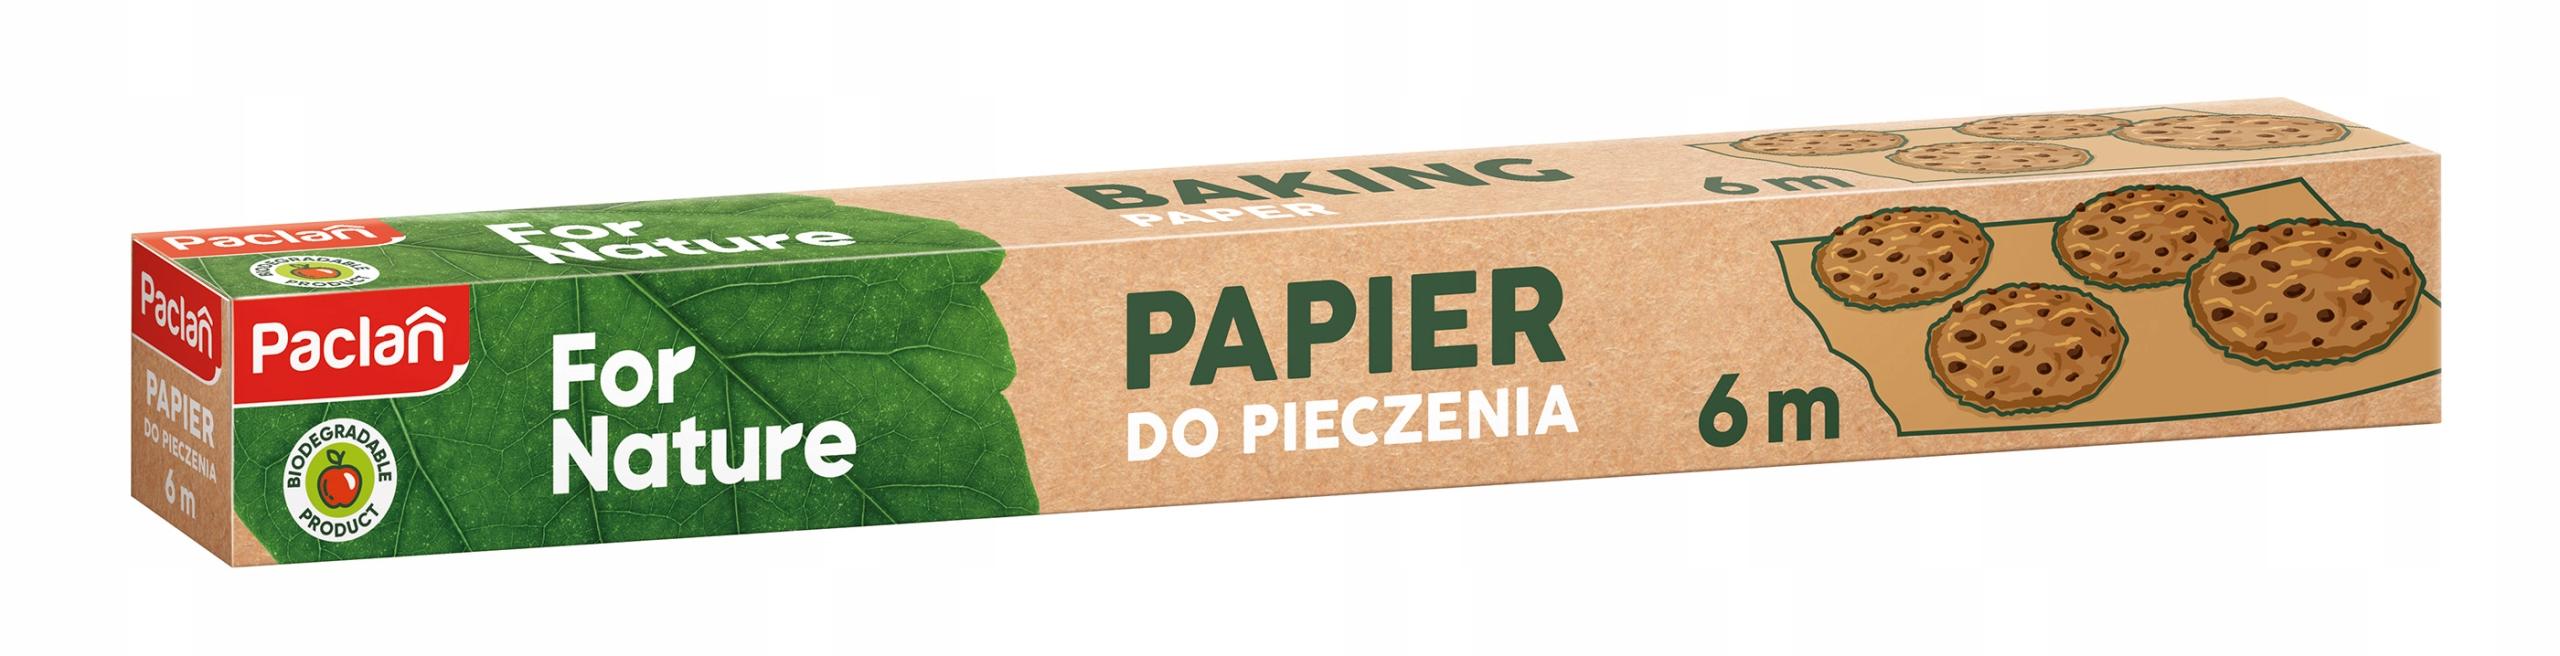 PAPIER DO PIECZENIA PACLAN FOR NATURE EKO BIO 6 M